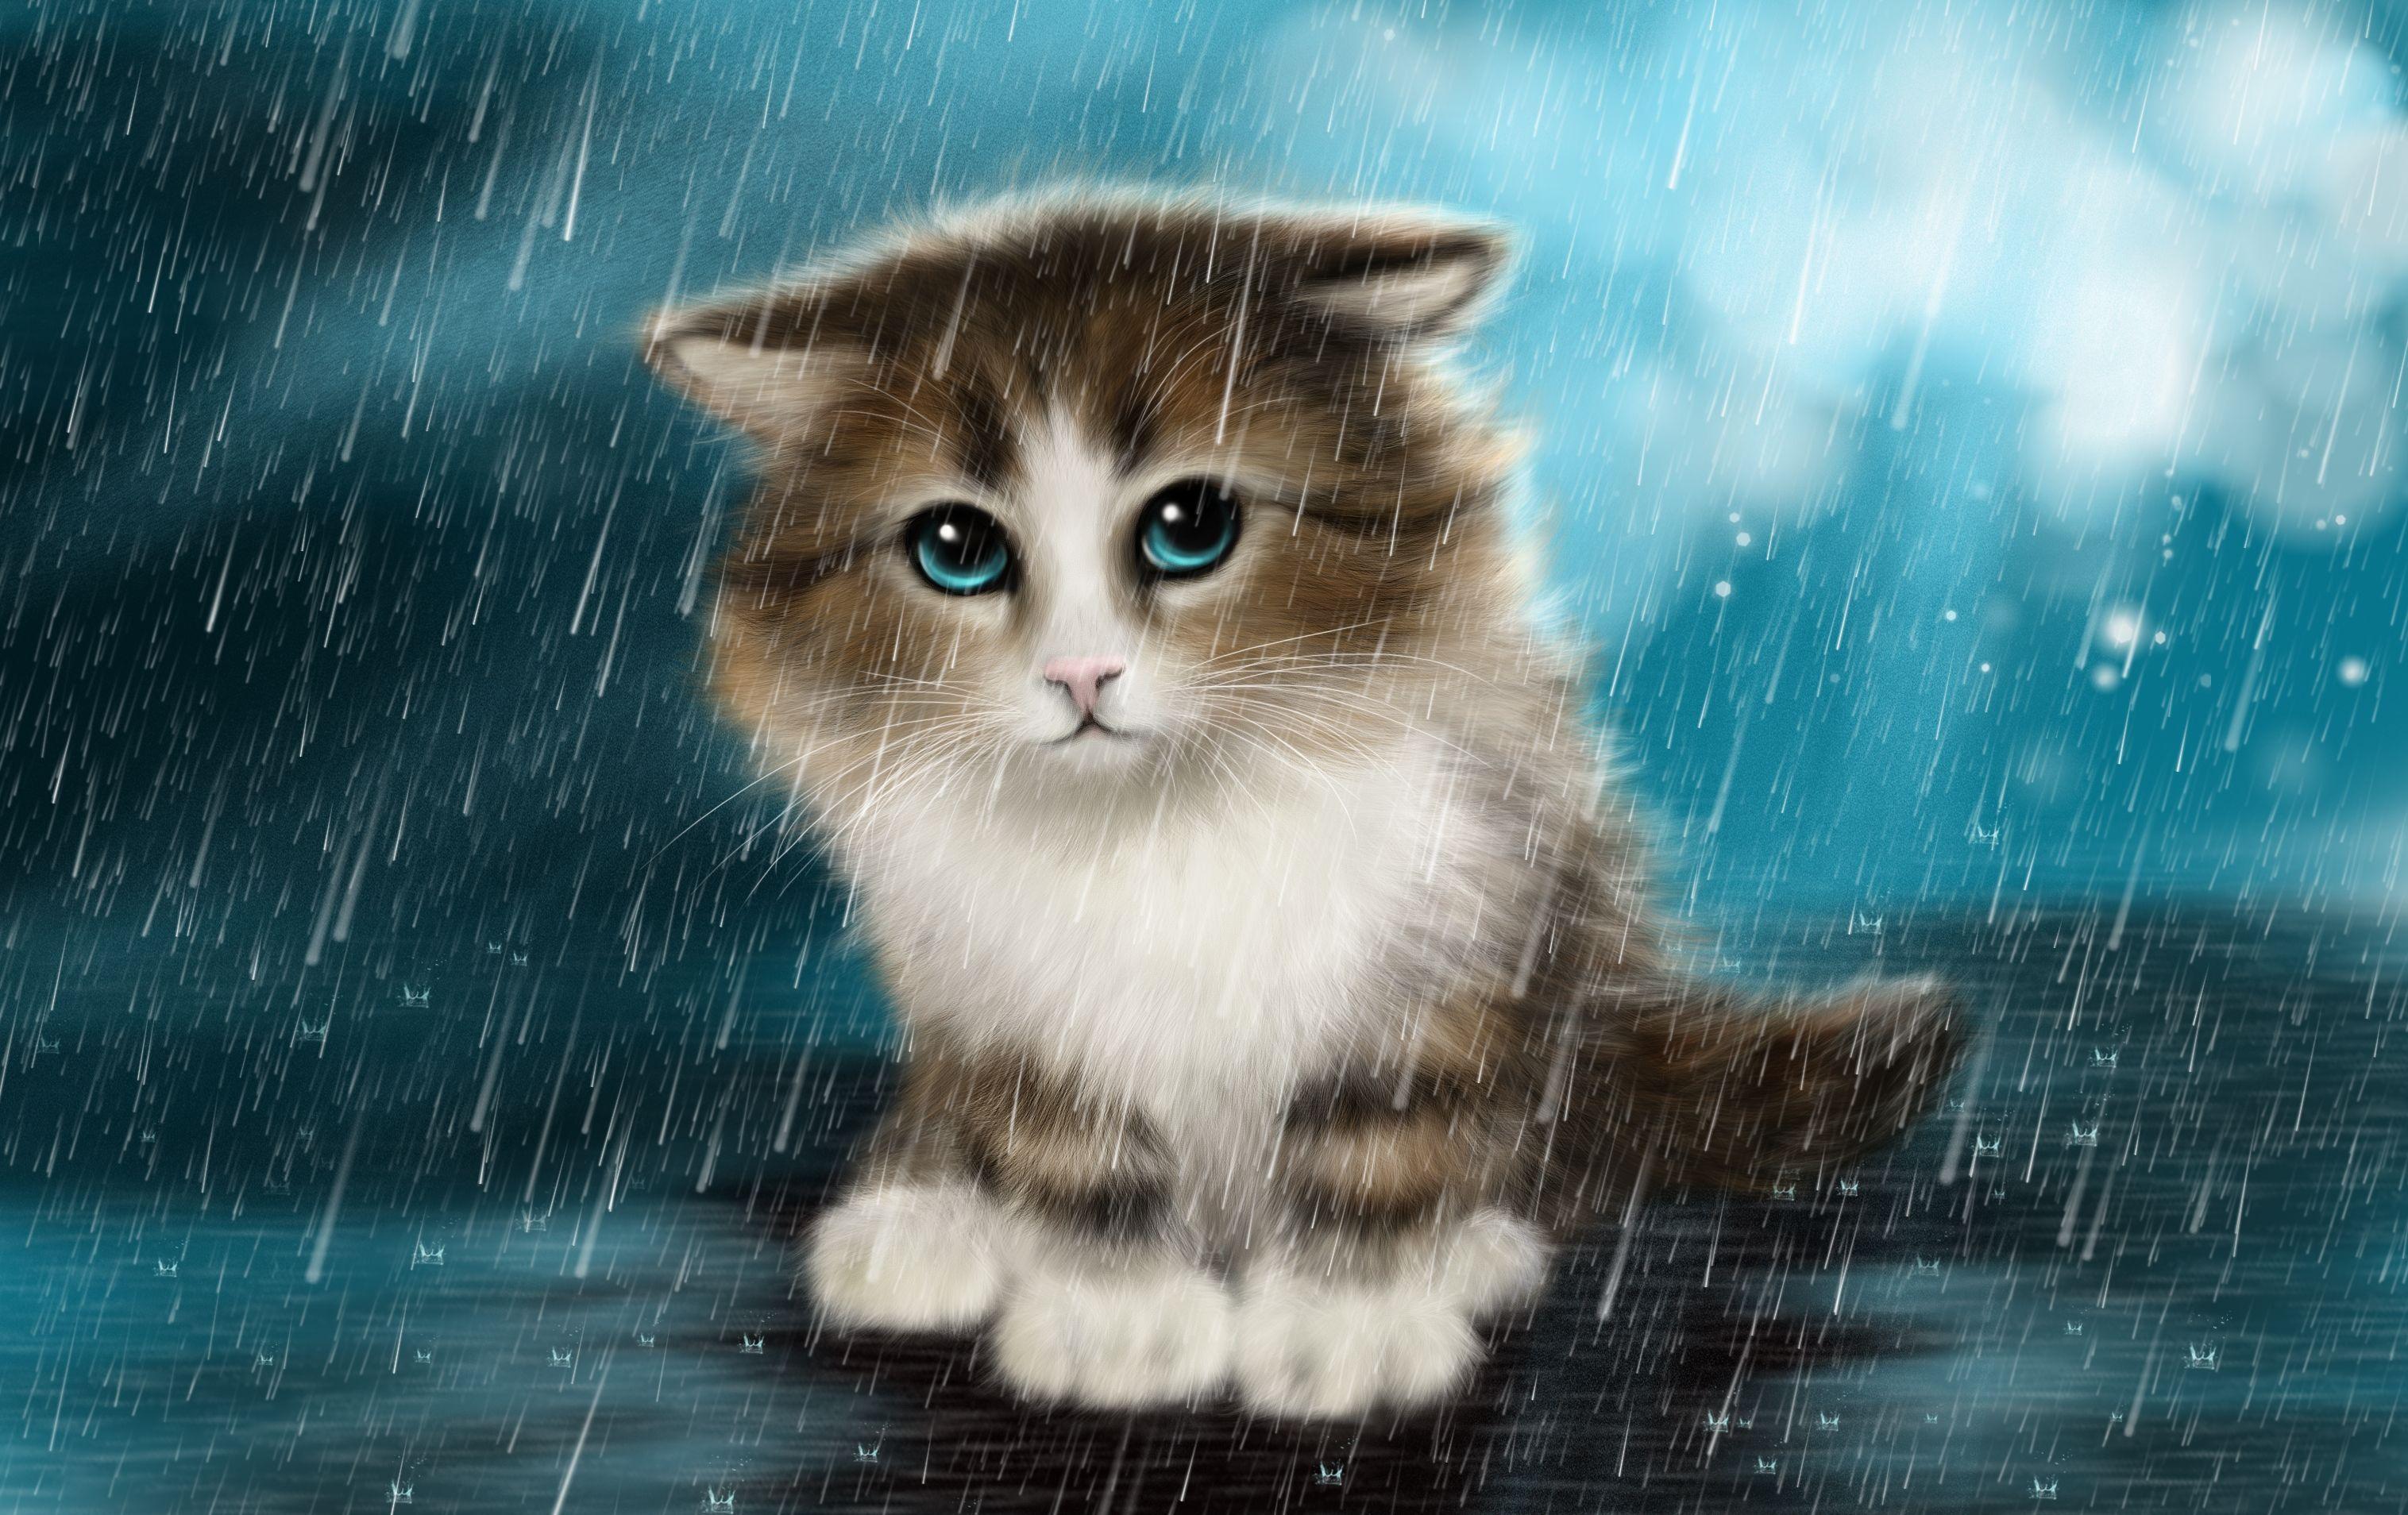 imágenes de gatitos tristes - Wallpapers Cute, Cat, Innocent, Animals,